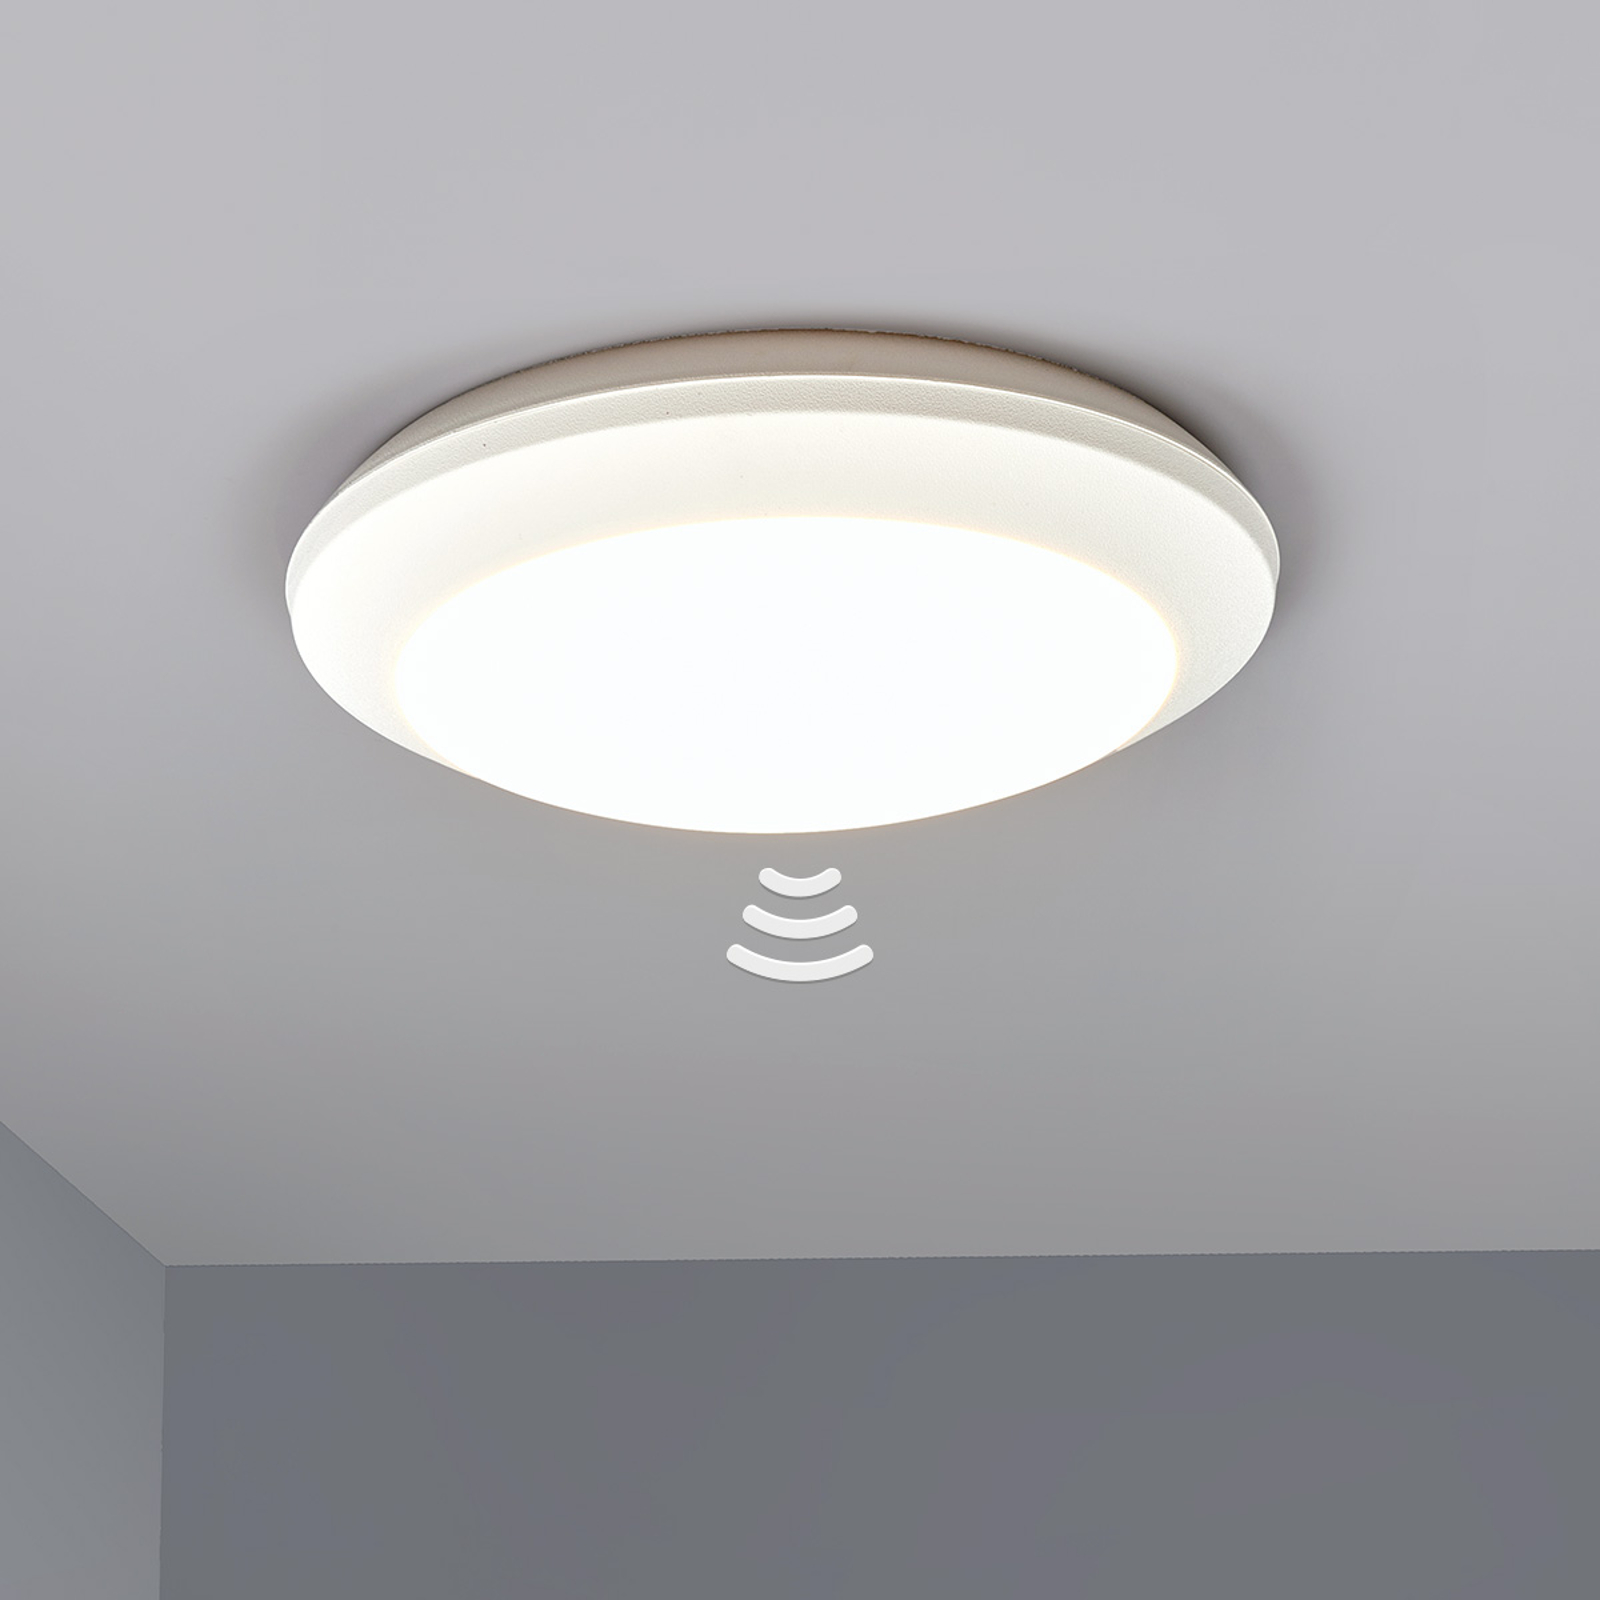 Sensor taklampe Umberta 2xE27 hvit